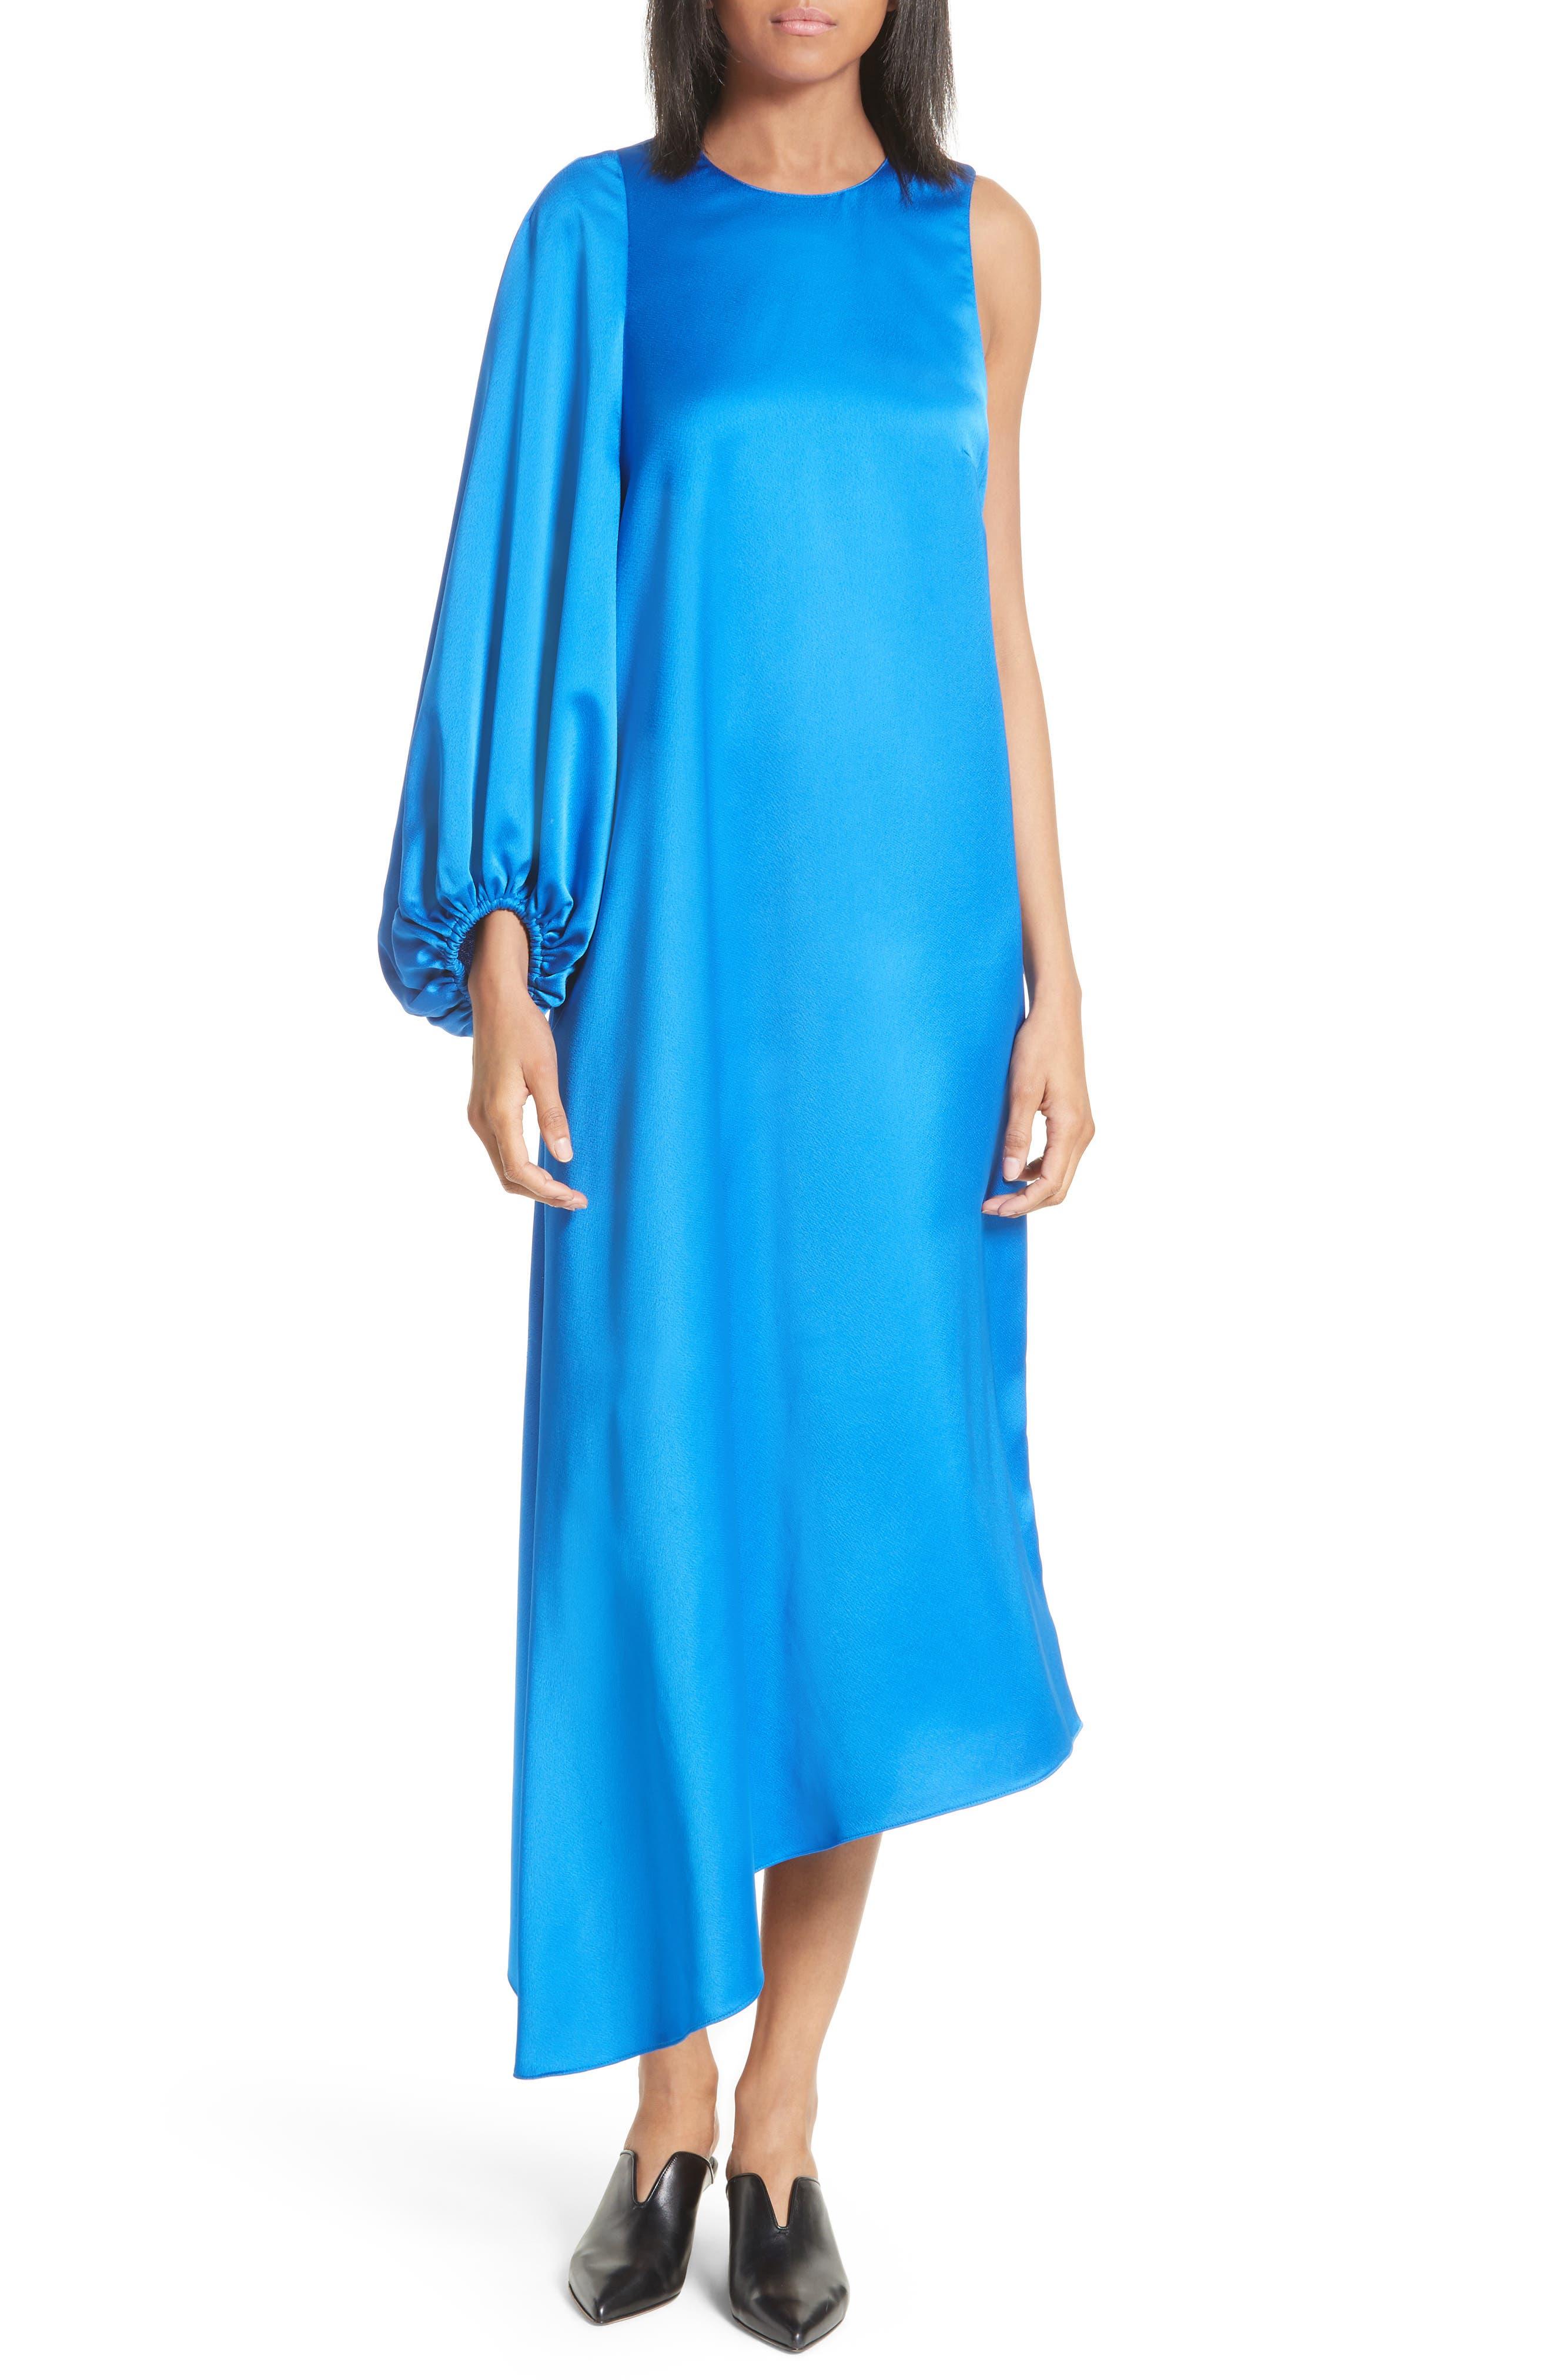 Tibi Celestia One Sleeve Bias Cut Satin Dress